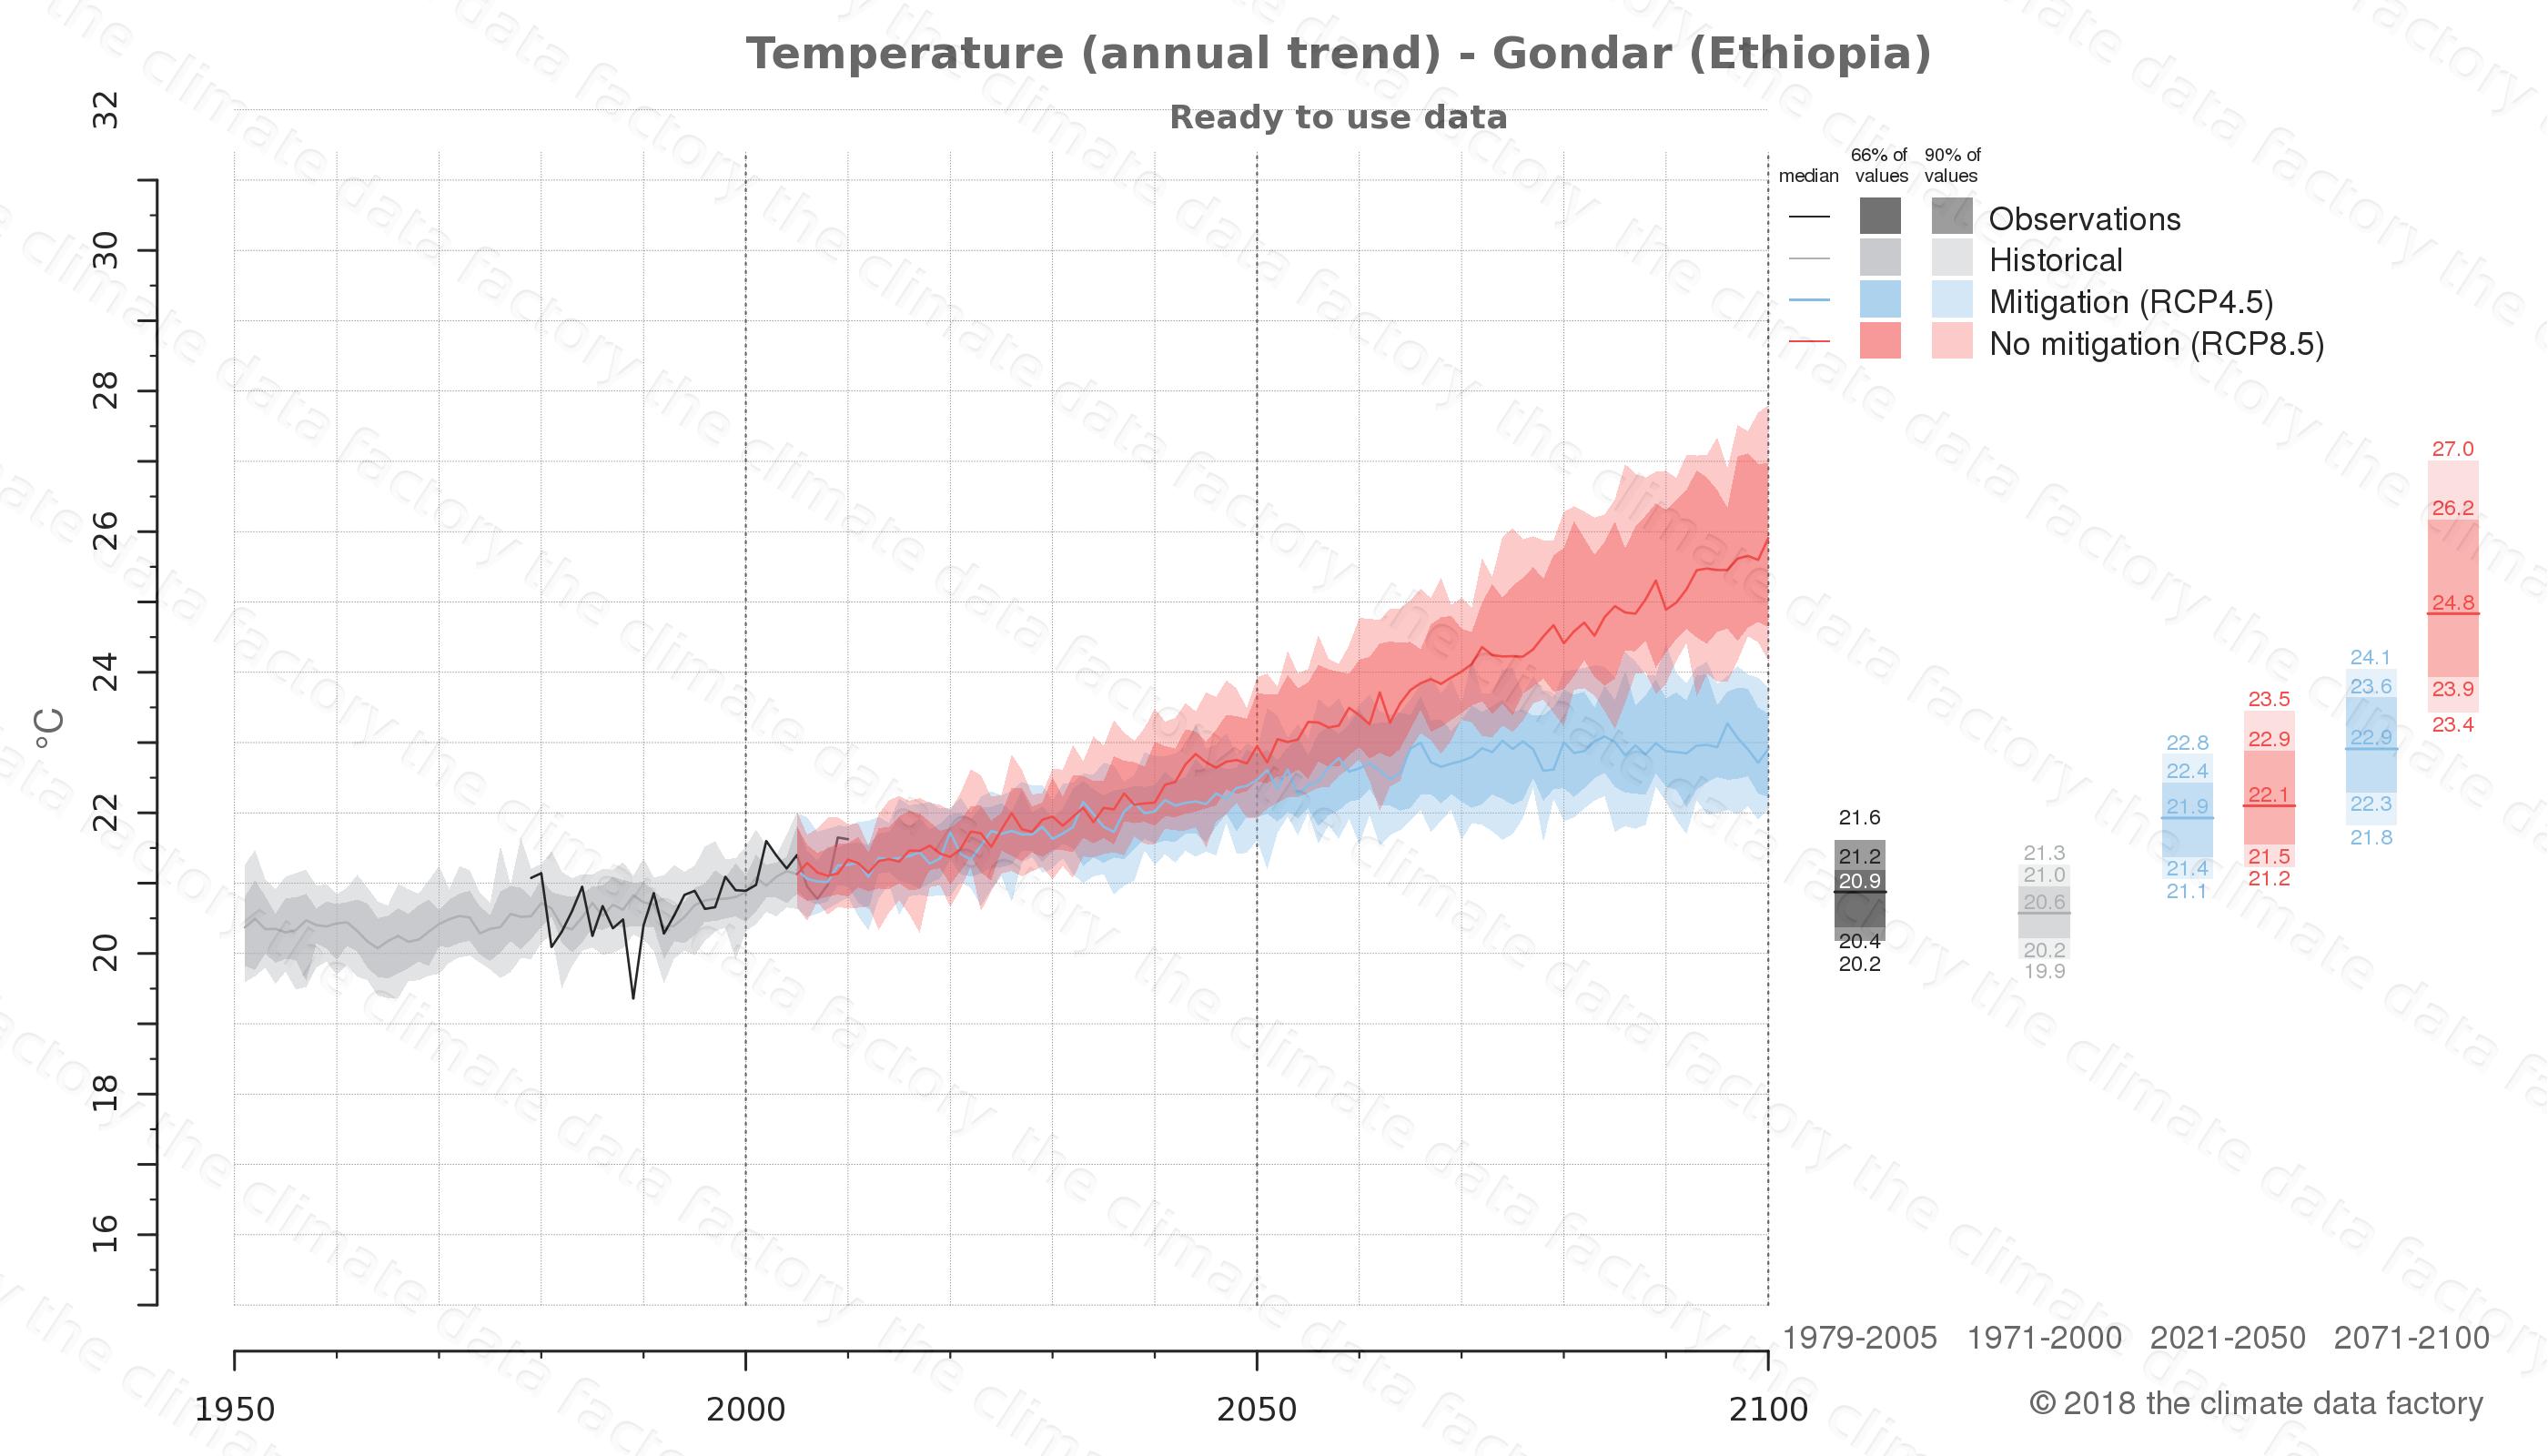 climate change data policy adaptation climate graph city data temperature gondar ethiopia